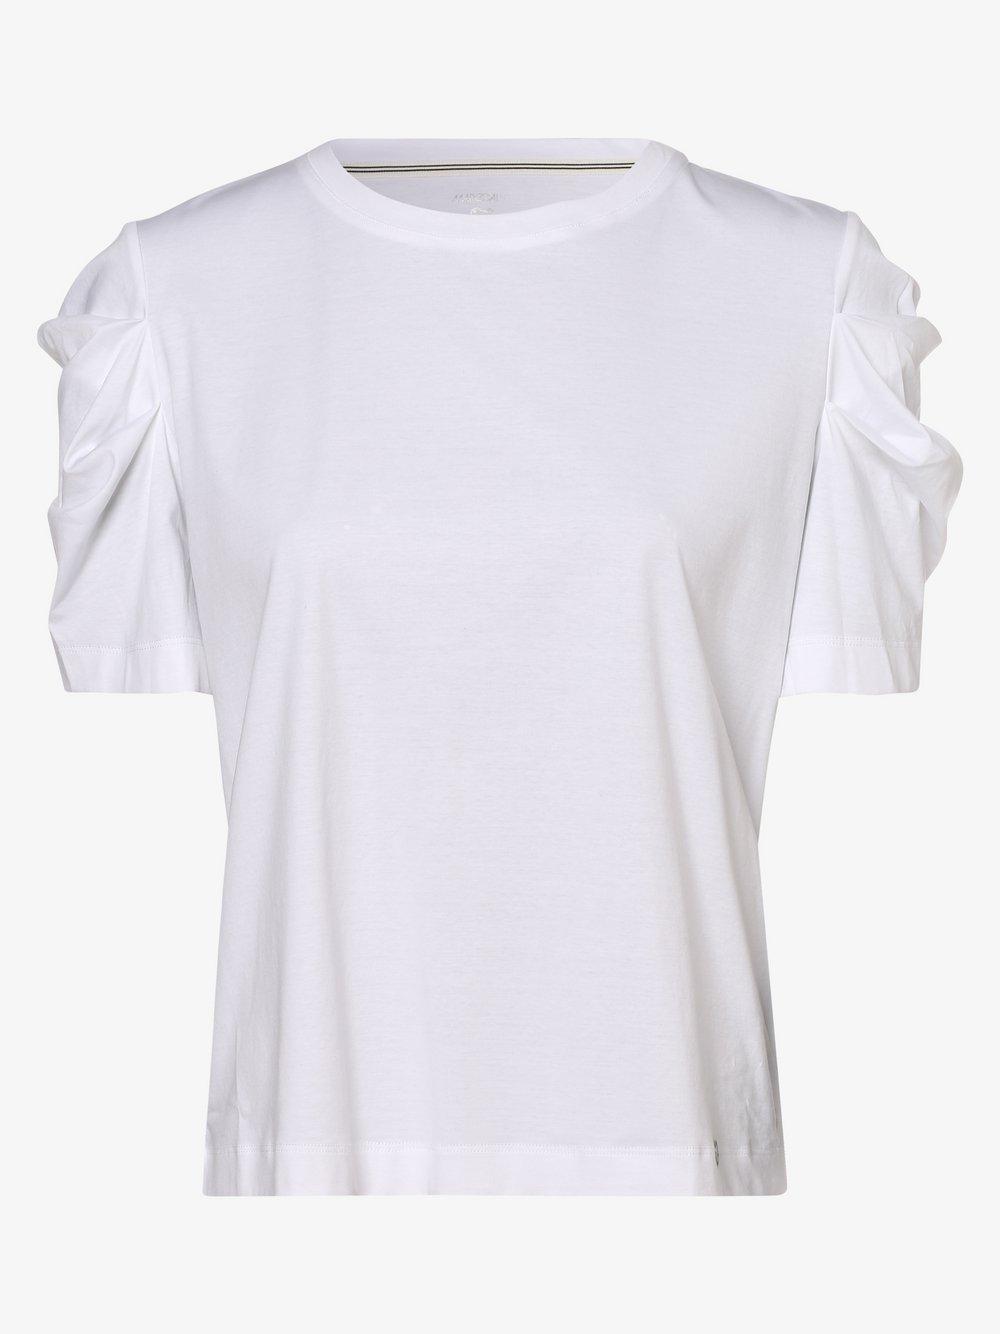 Marc Cain Collections - T-shirt damski, biały